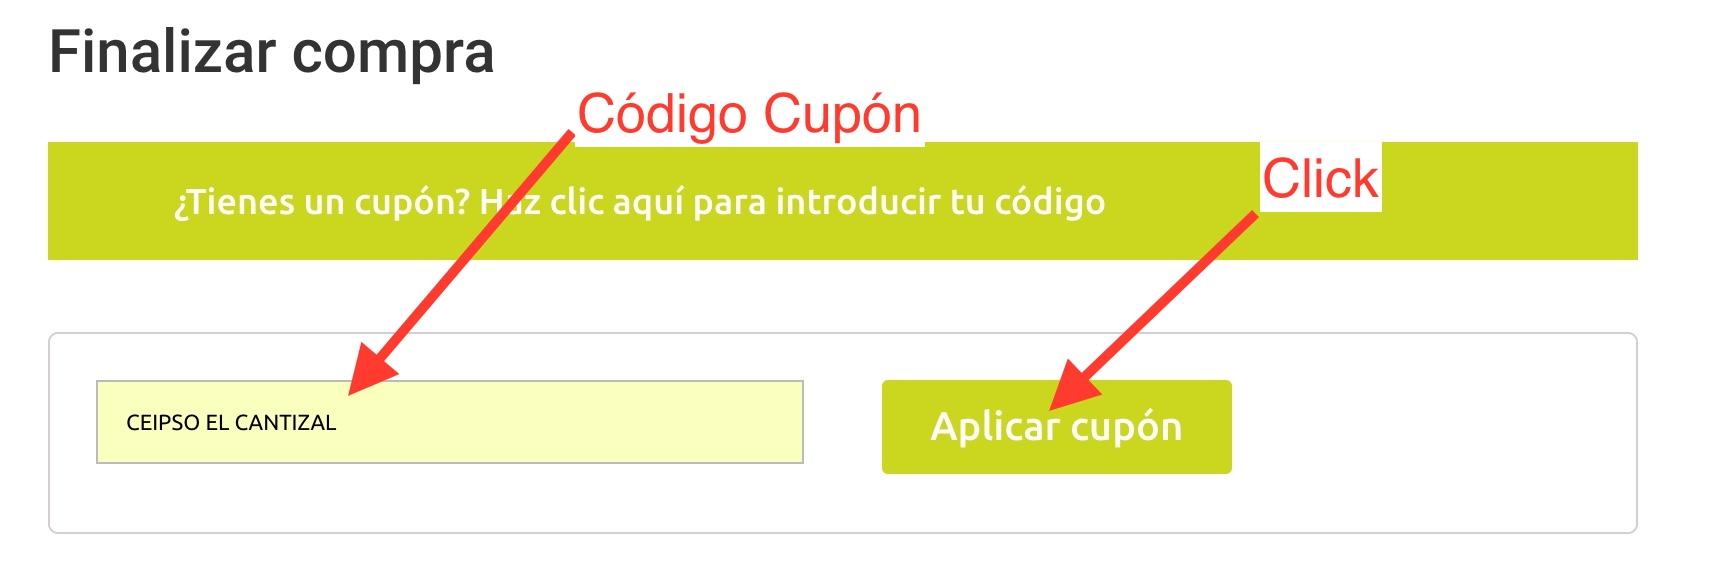 cupon-2